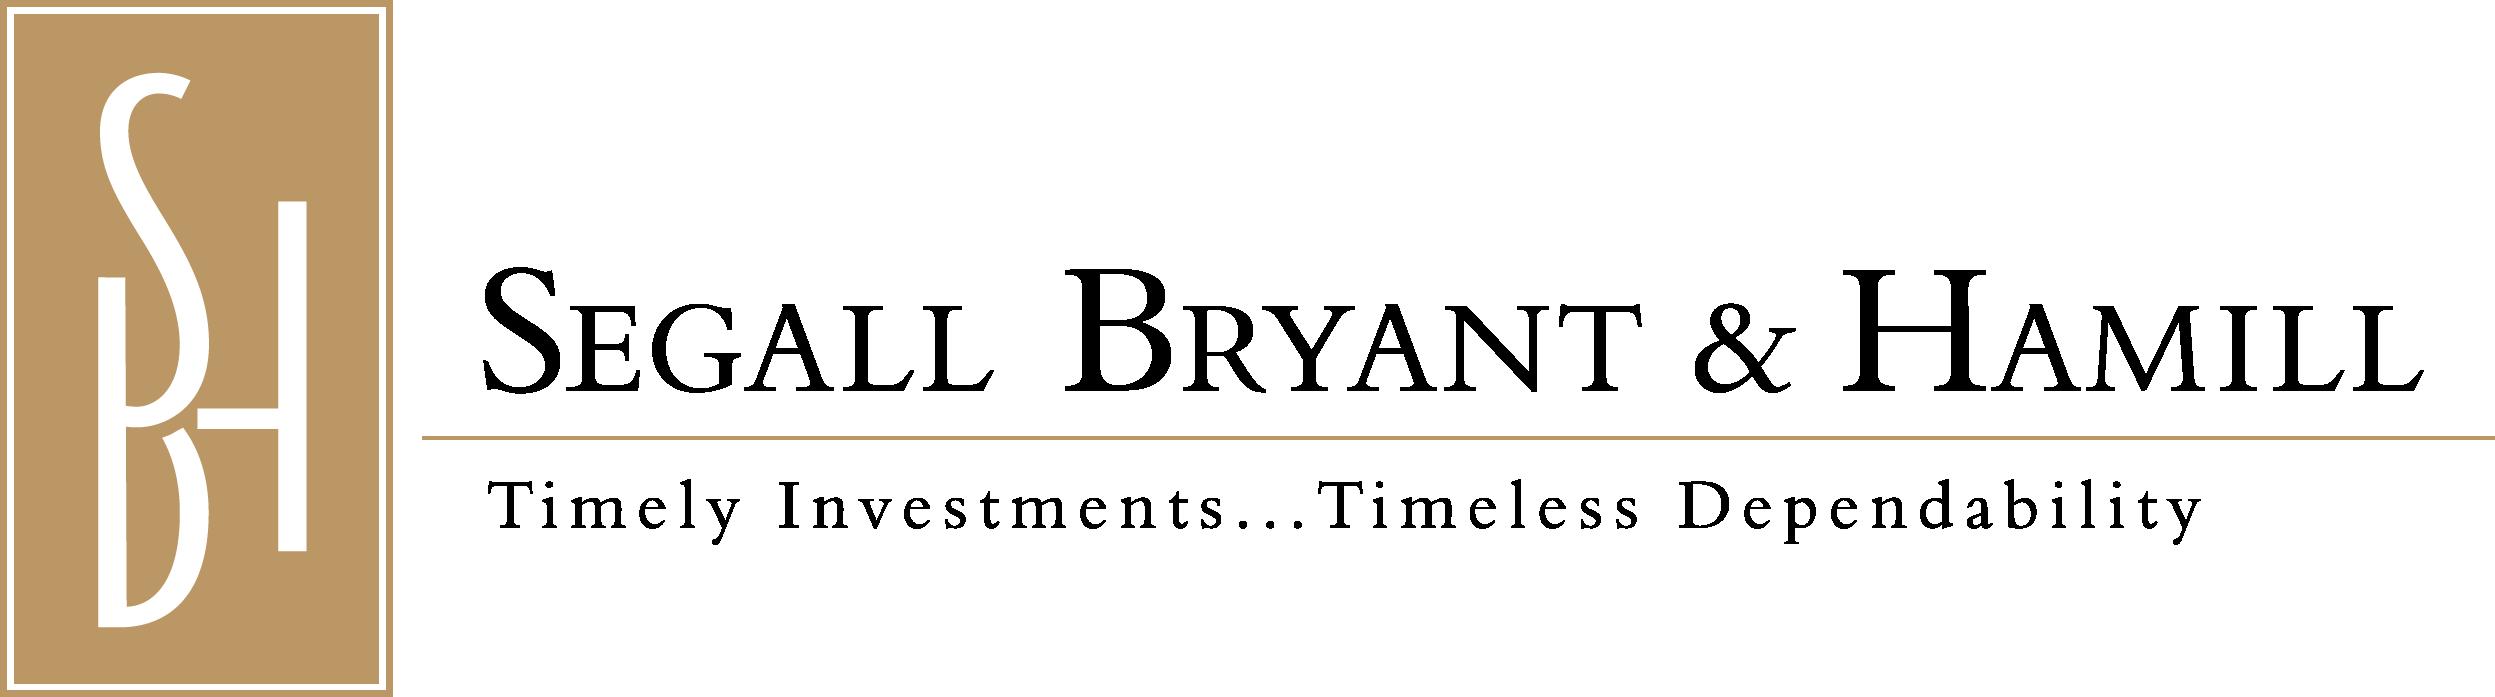 Segall Bryant Hamill Logo